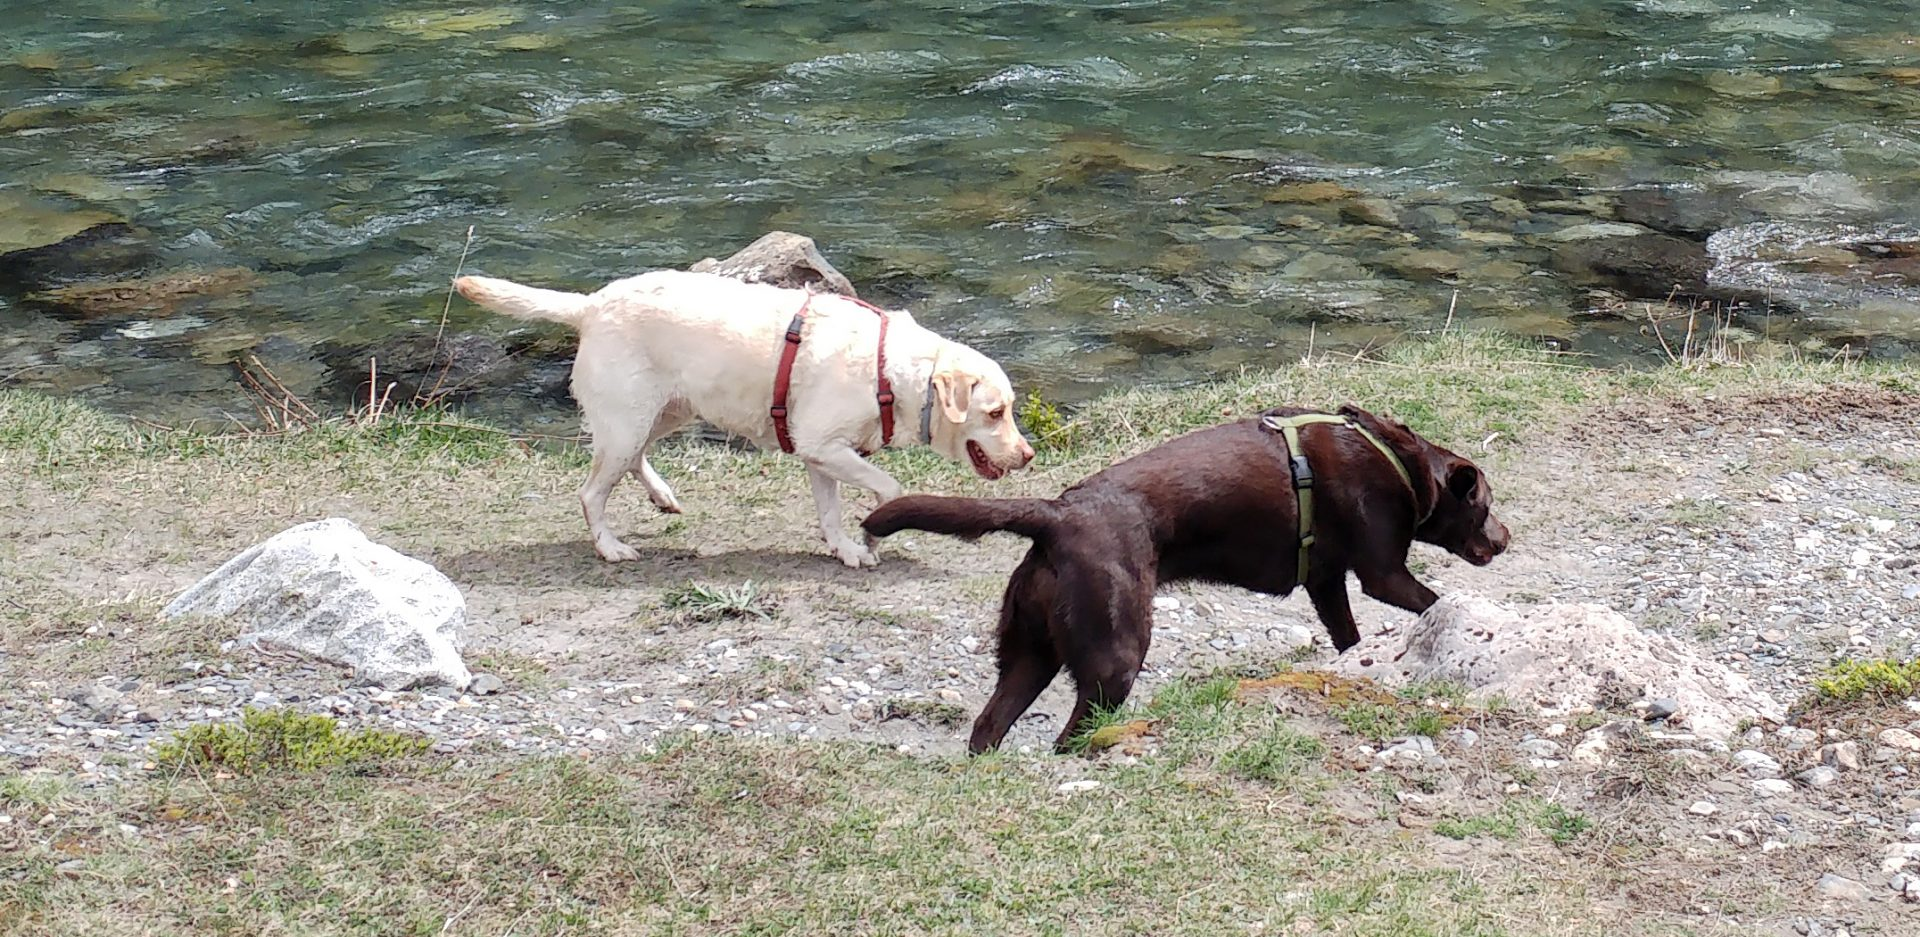 Rumba y Salsa, dos labradores, paseando por un río